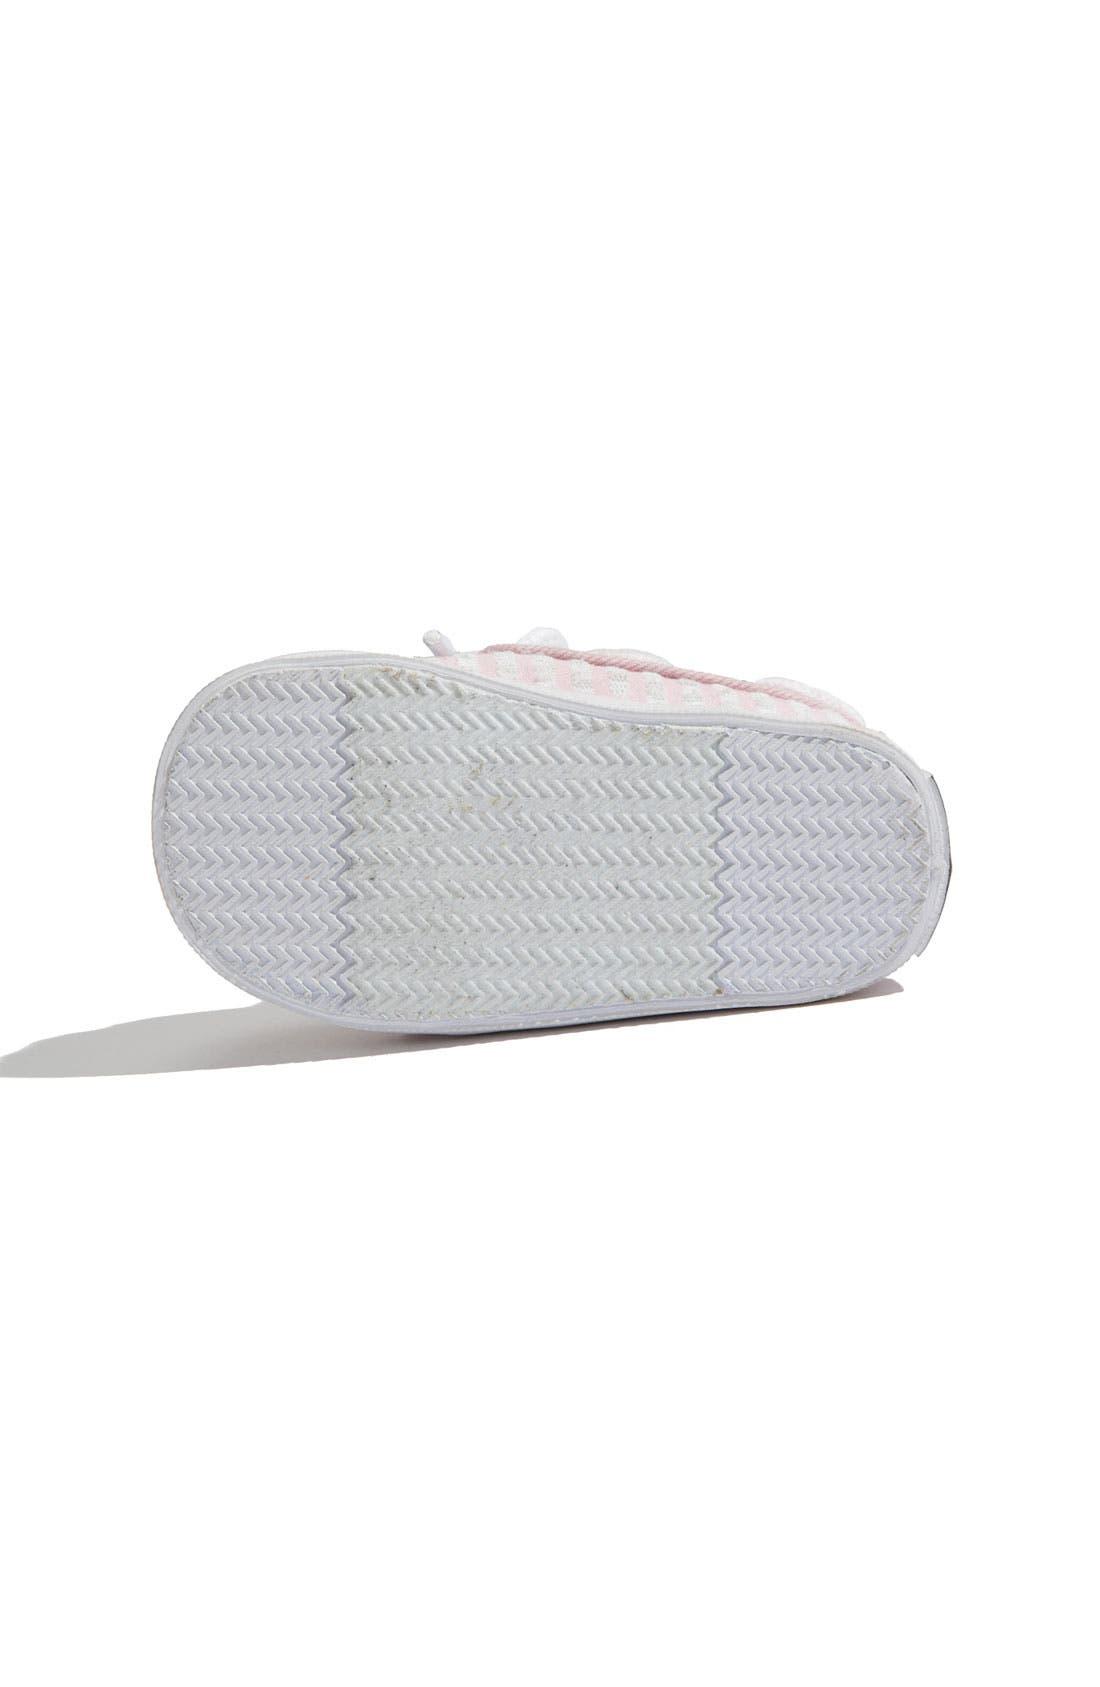 Alternate Image 4  - Sperry Kids 'Bahama' Crib Shoe (Baby)